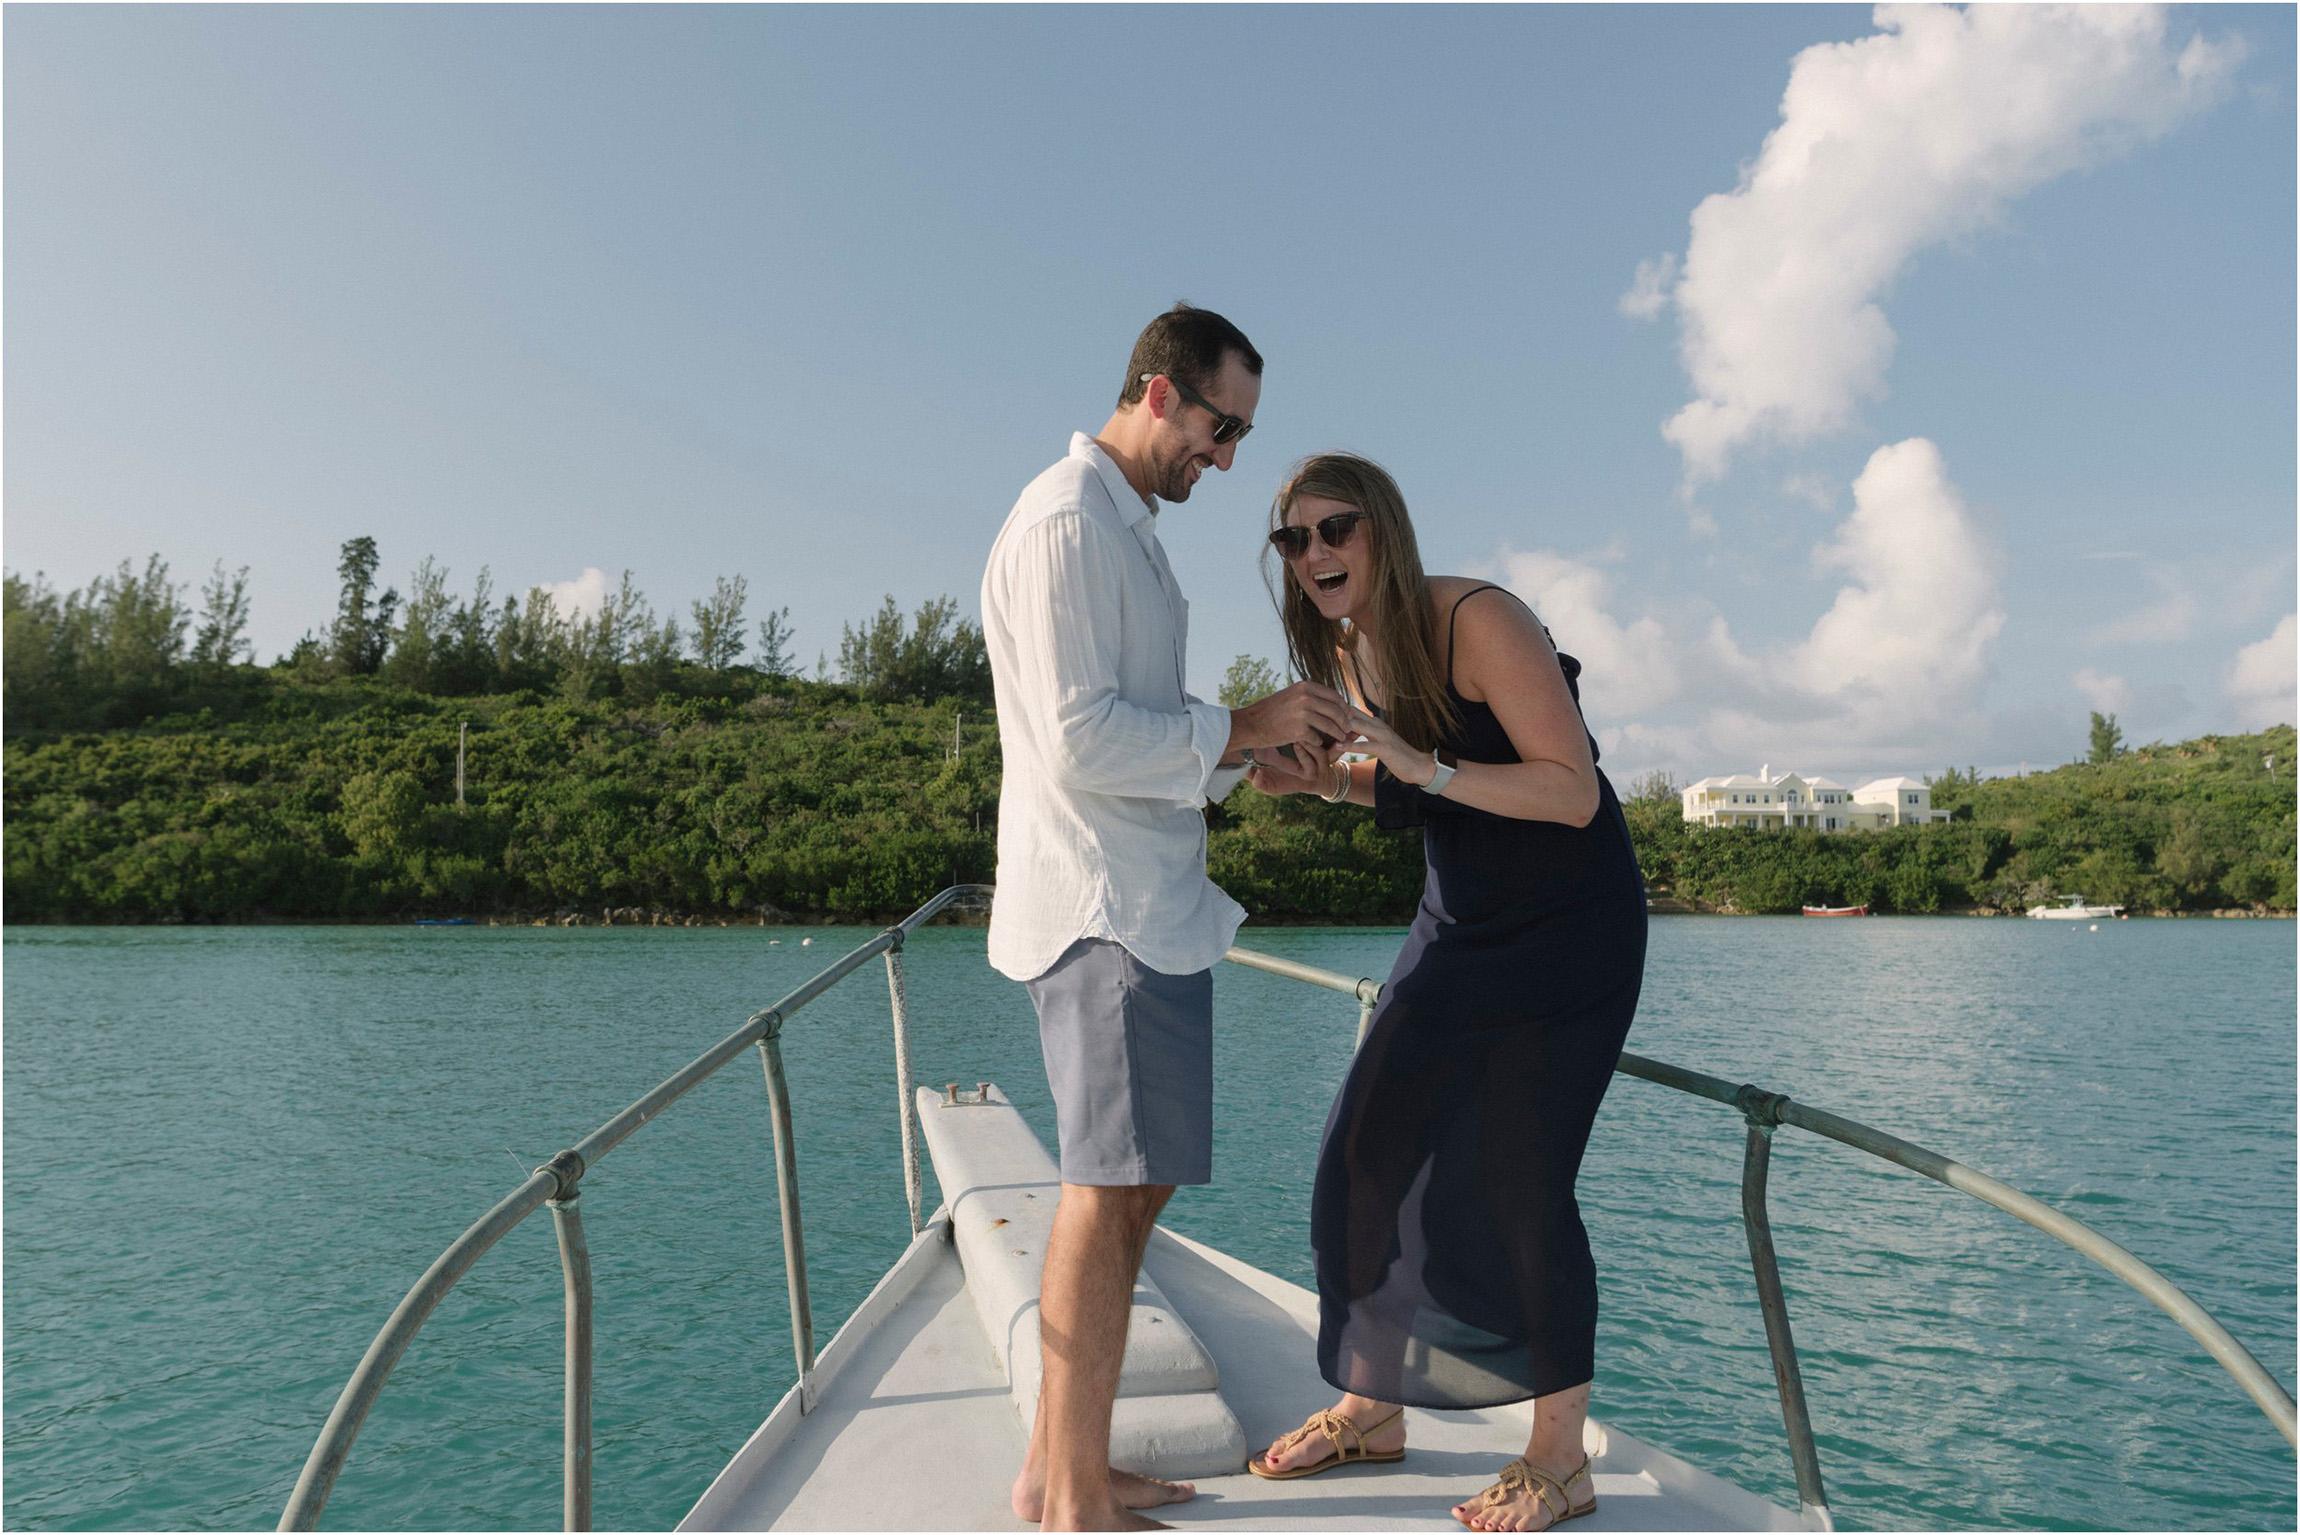 ©FianderFoto_Proposal Photographer_Bermuda_Kelly_Mike_005.jpg